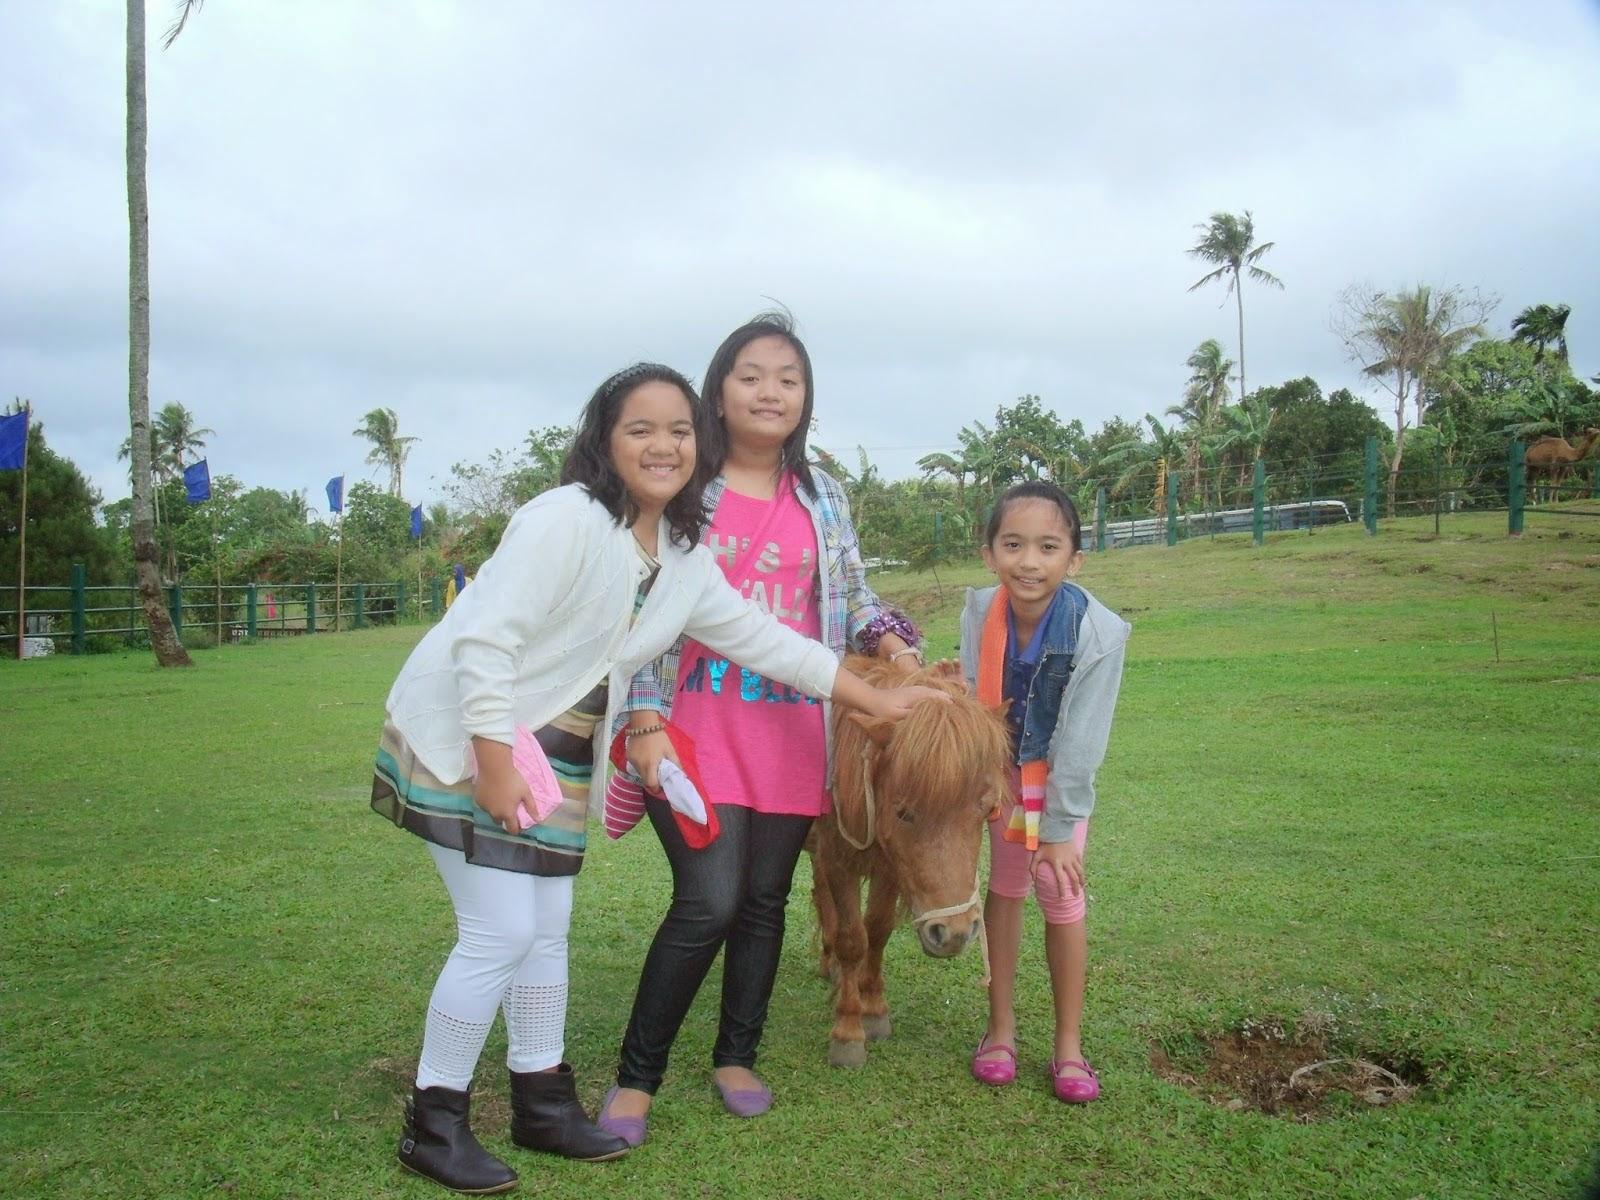 Paradizoo, Mendez, Cavite